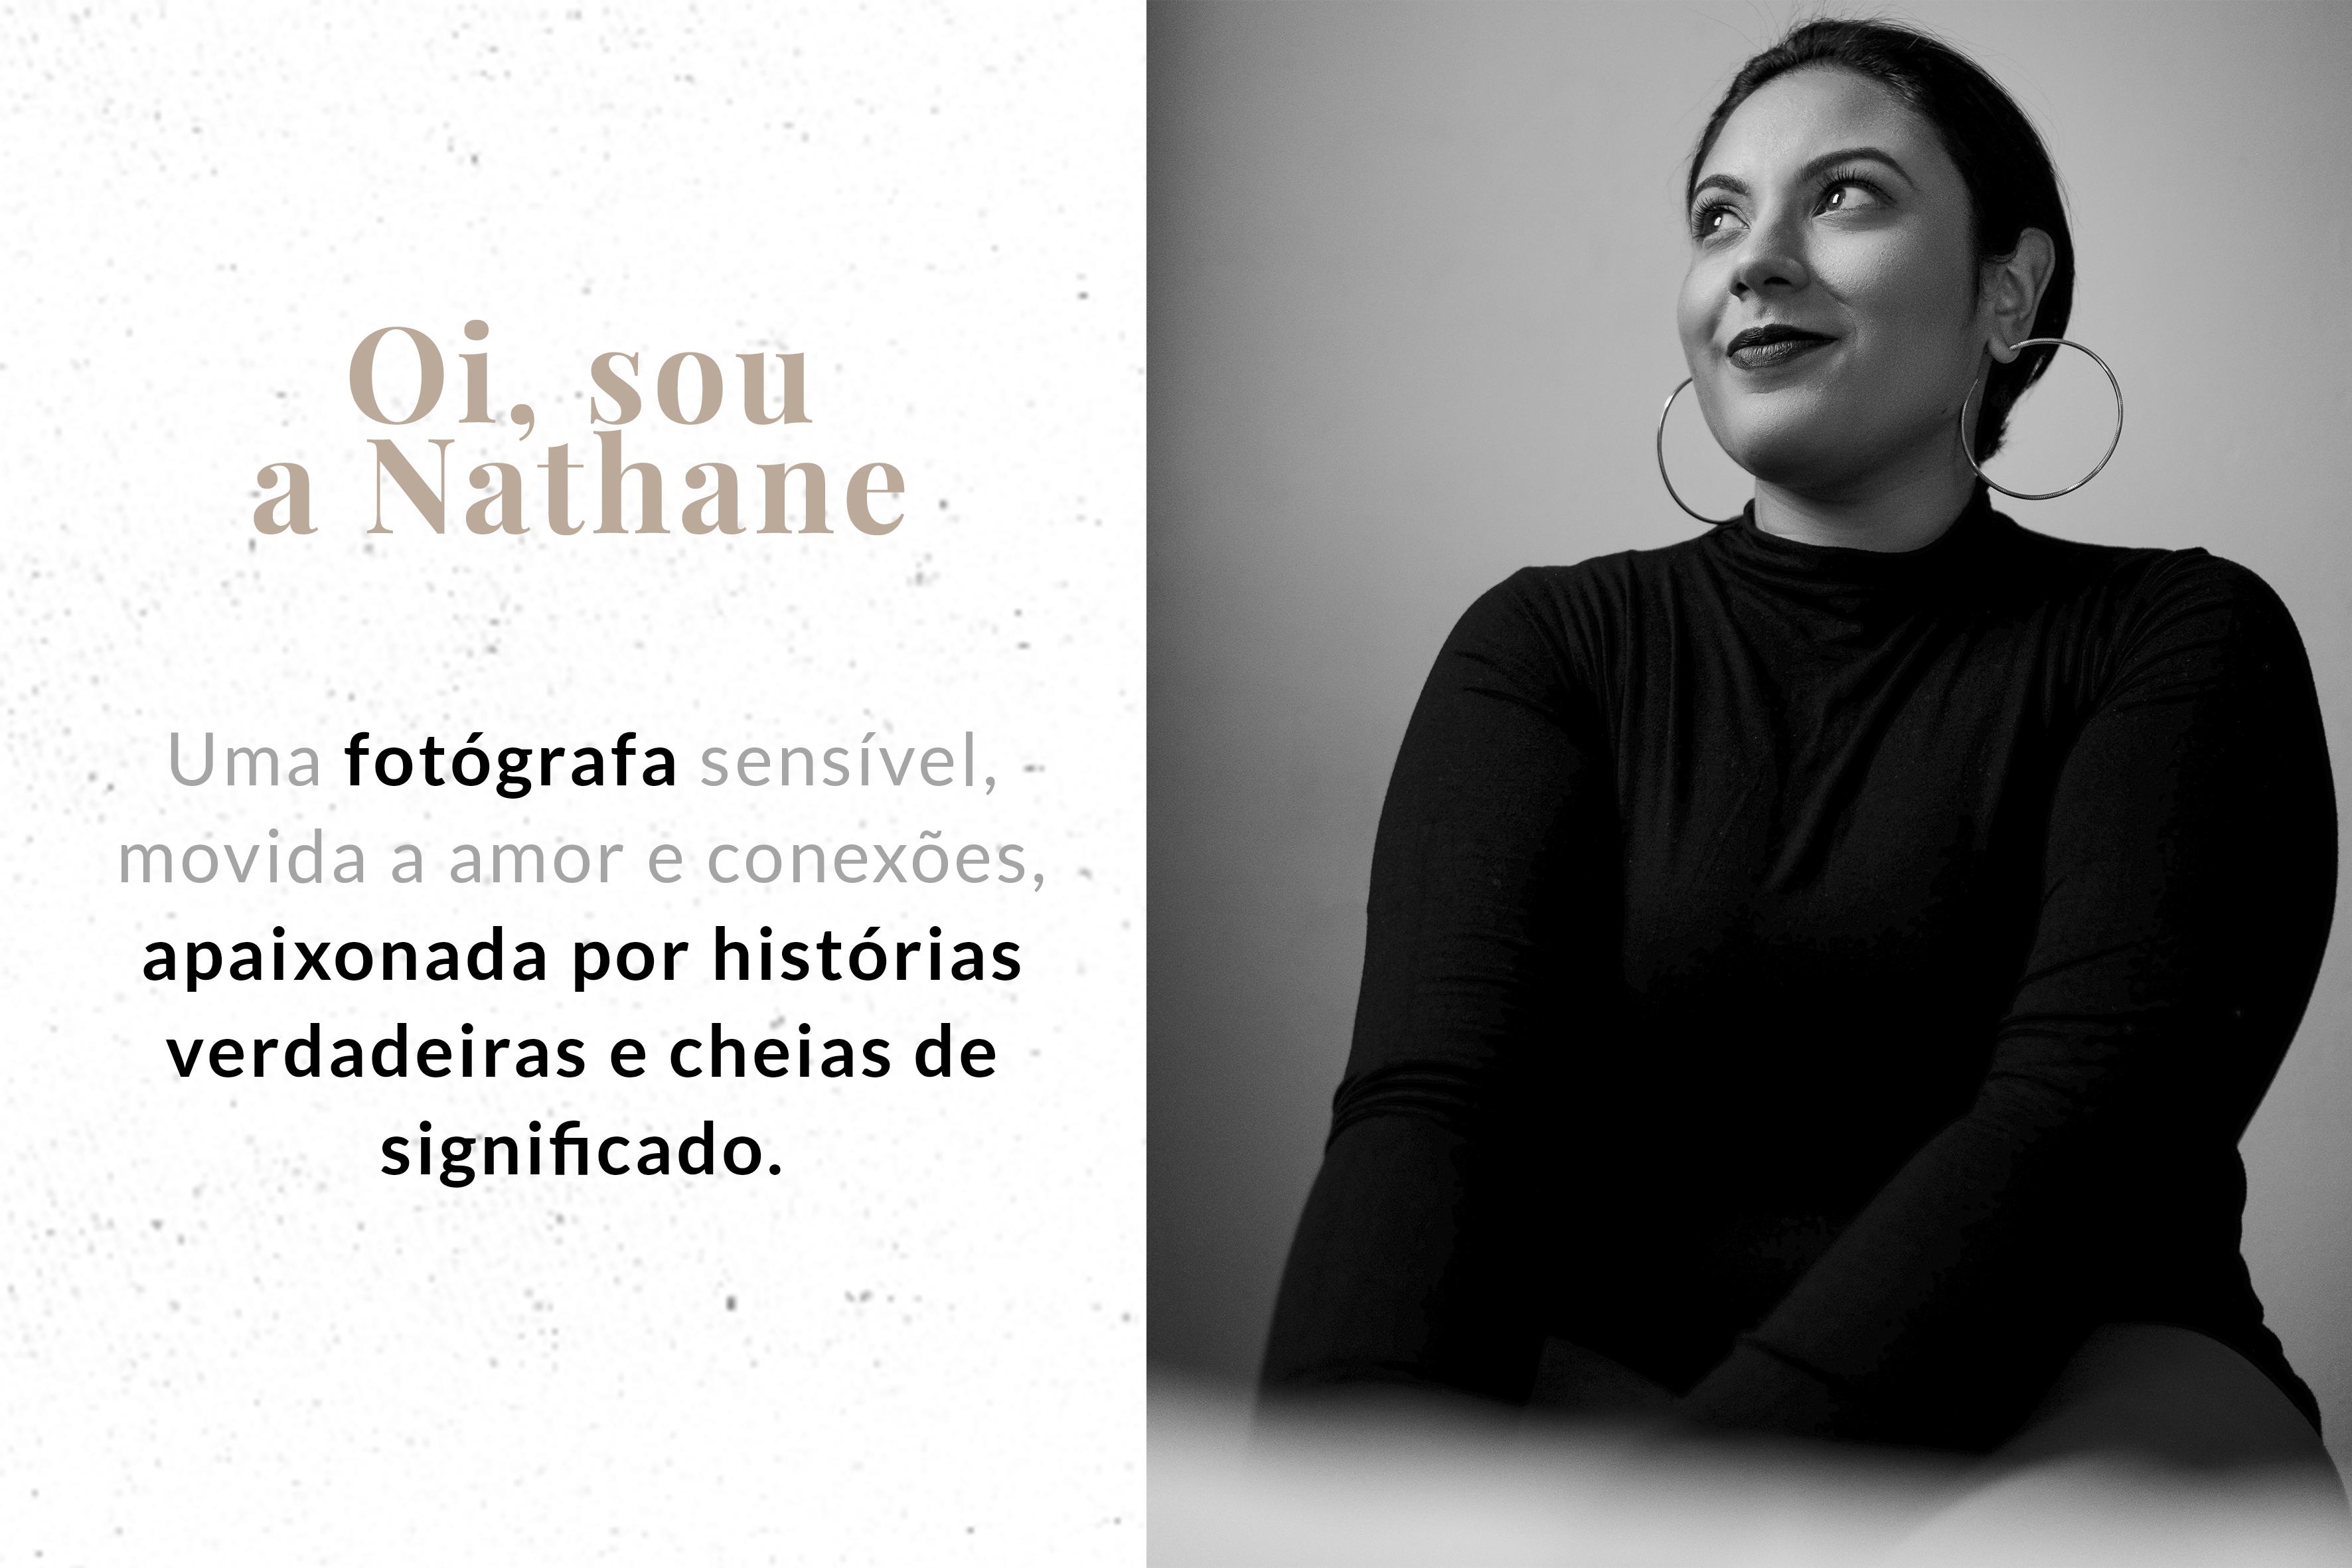 Sobre Nathane Fotografia